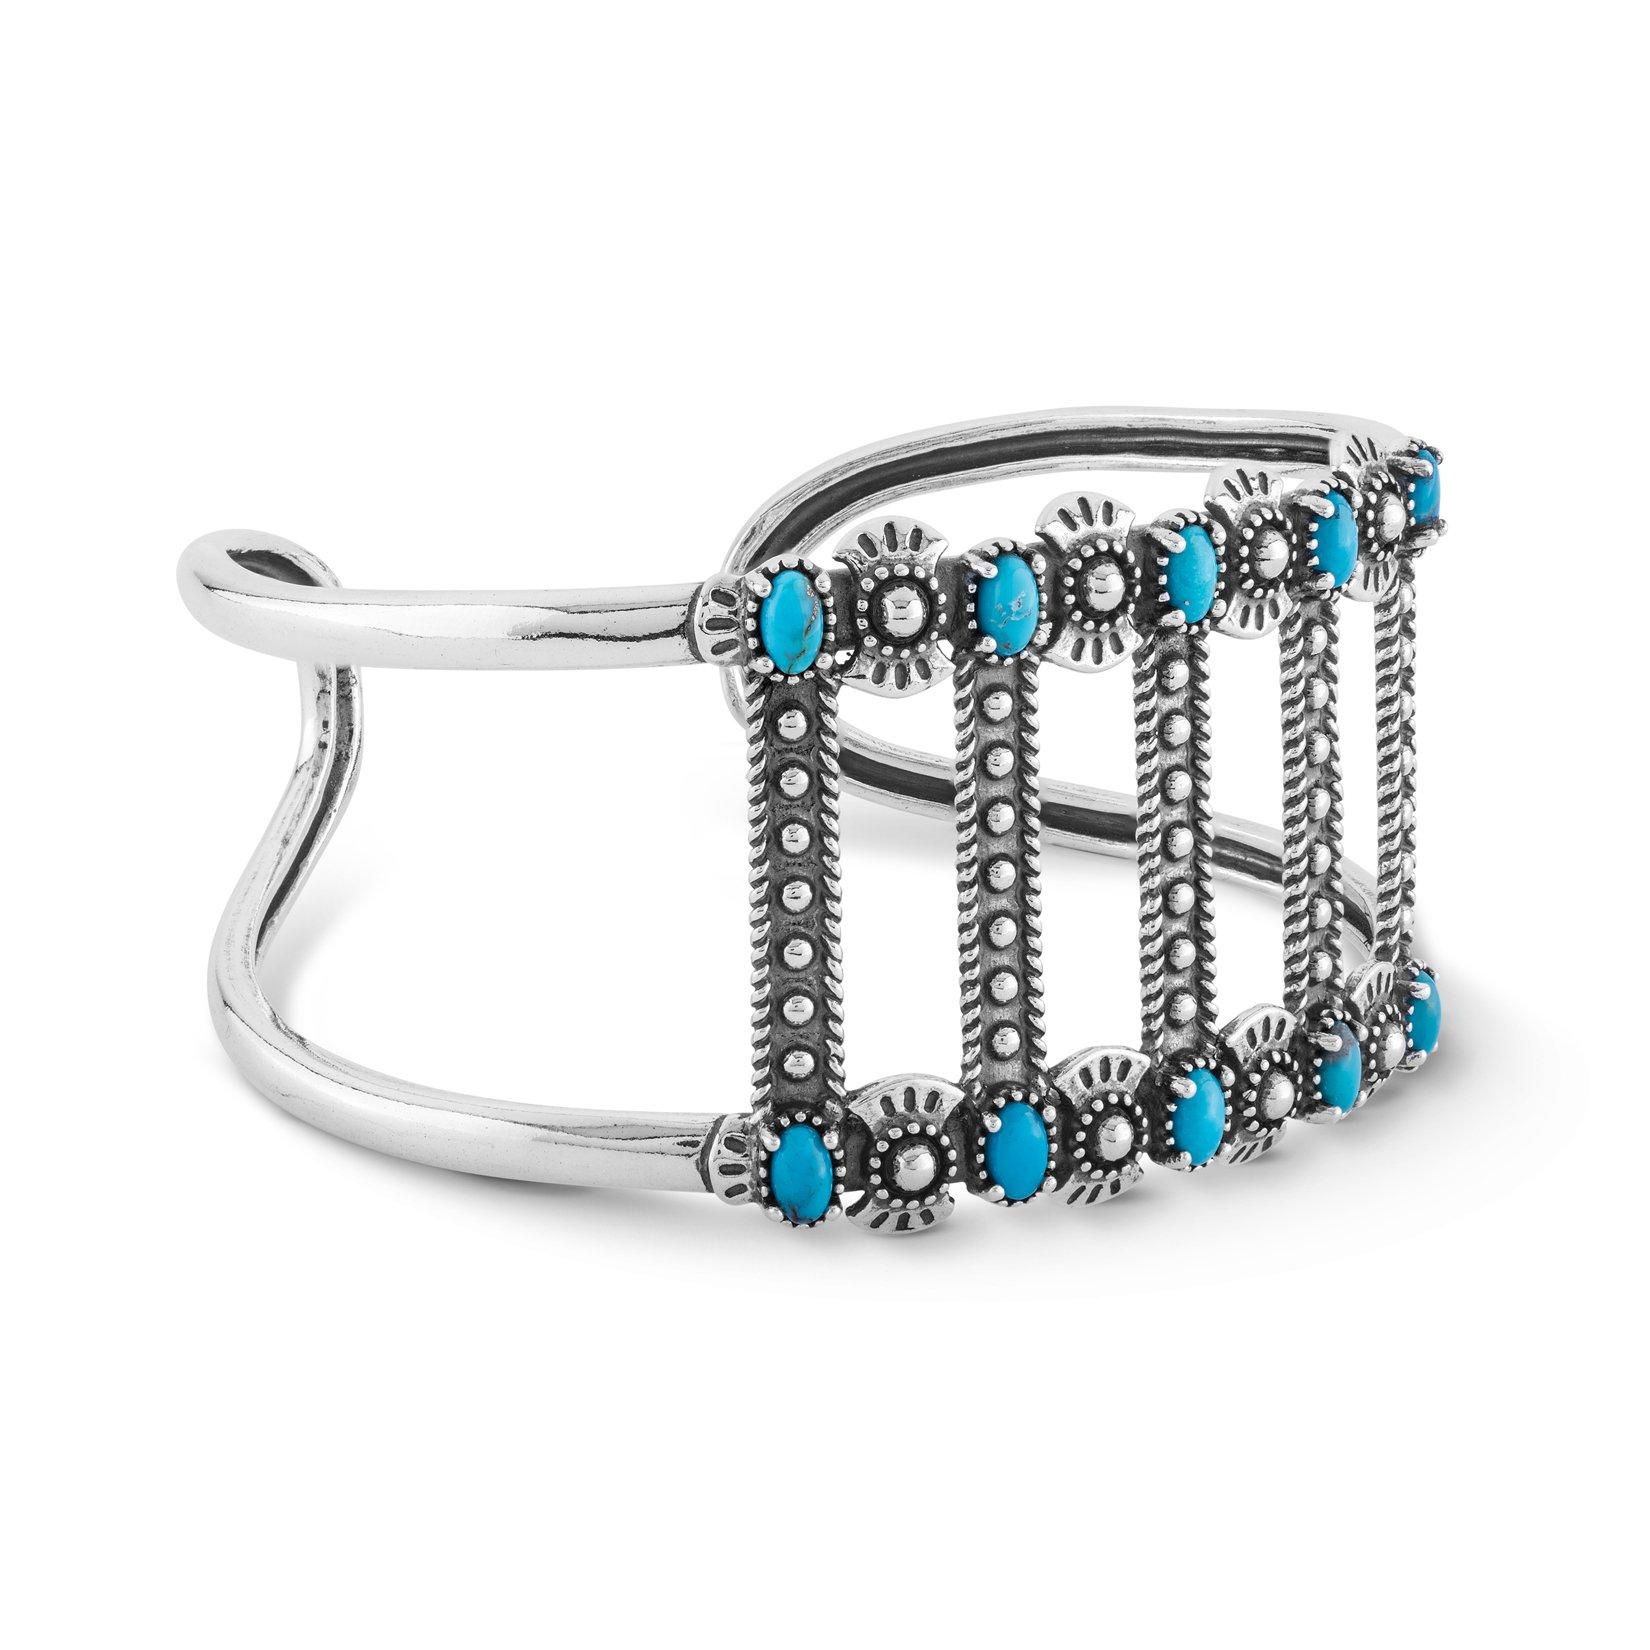 American West Turquoise Bar Bracelet